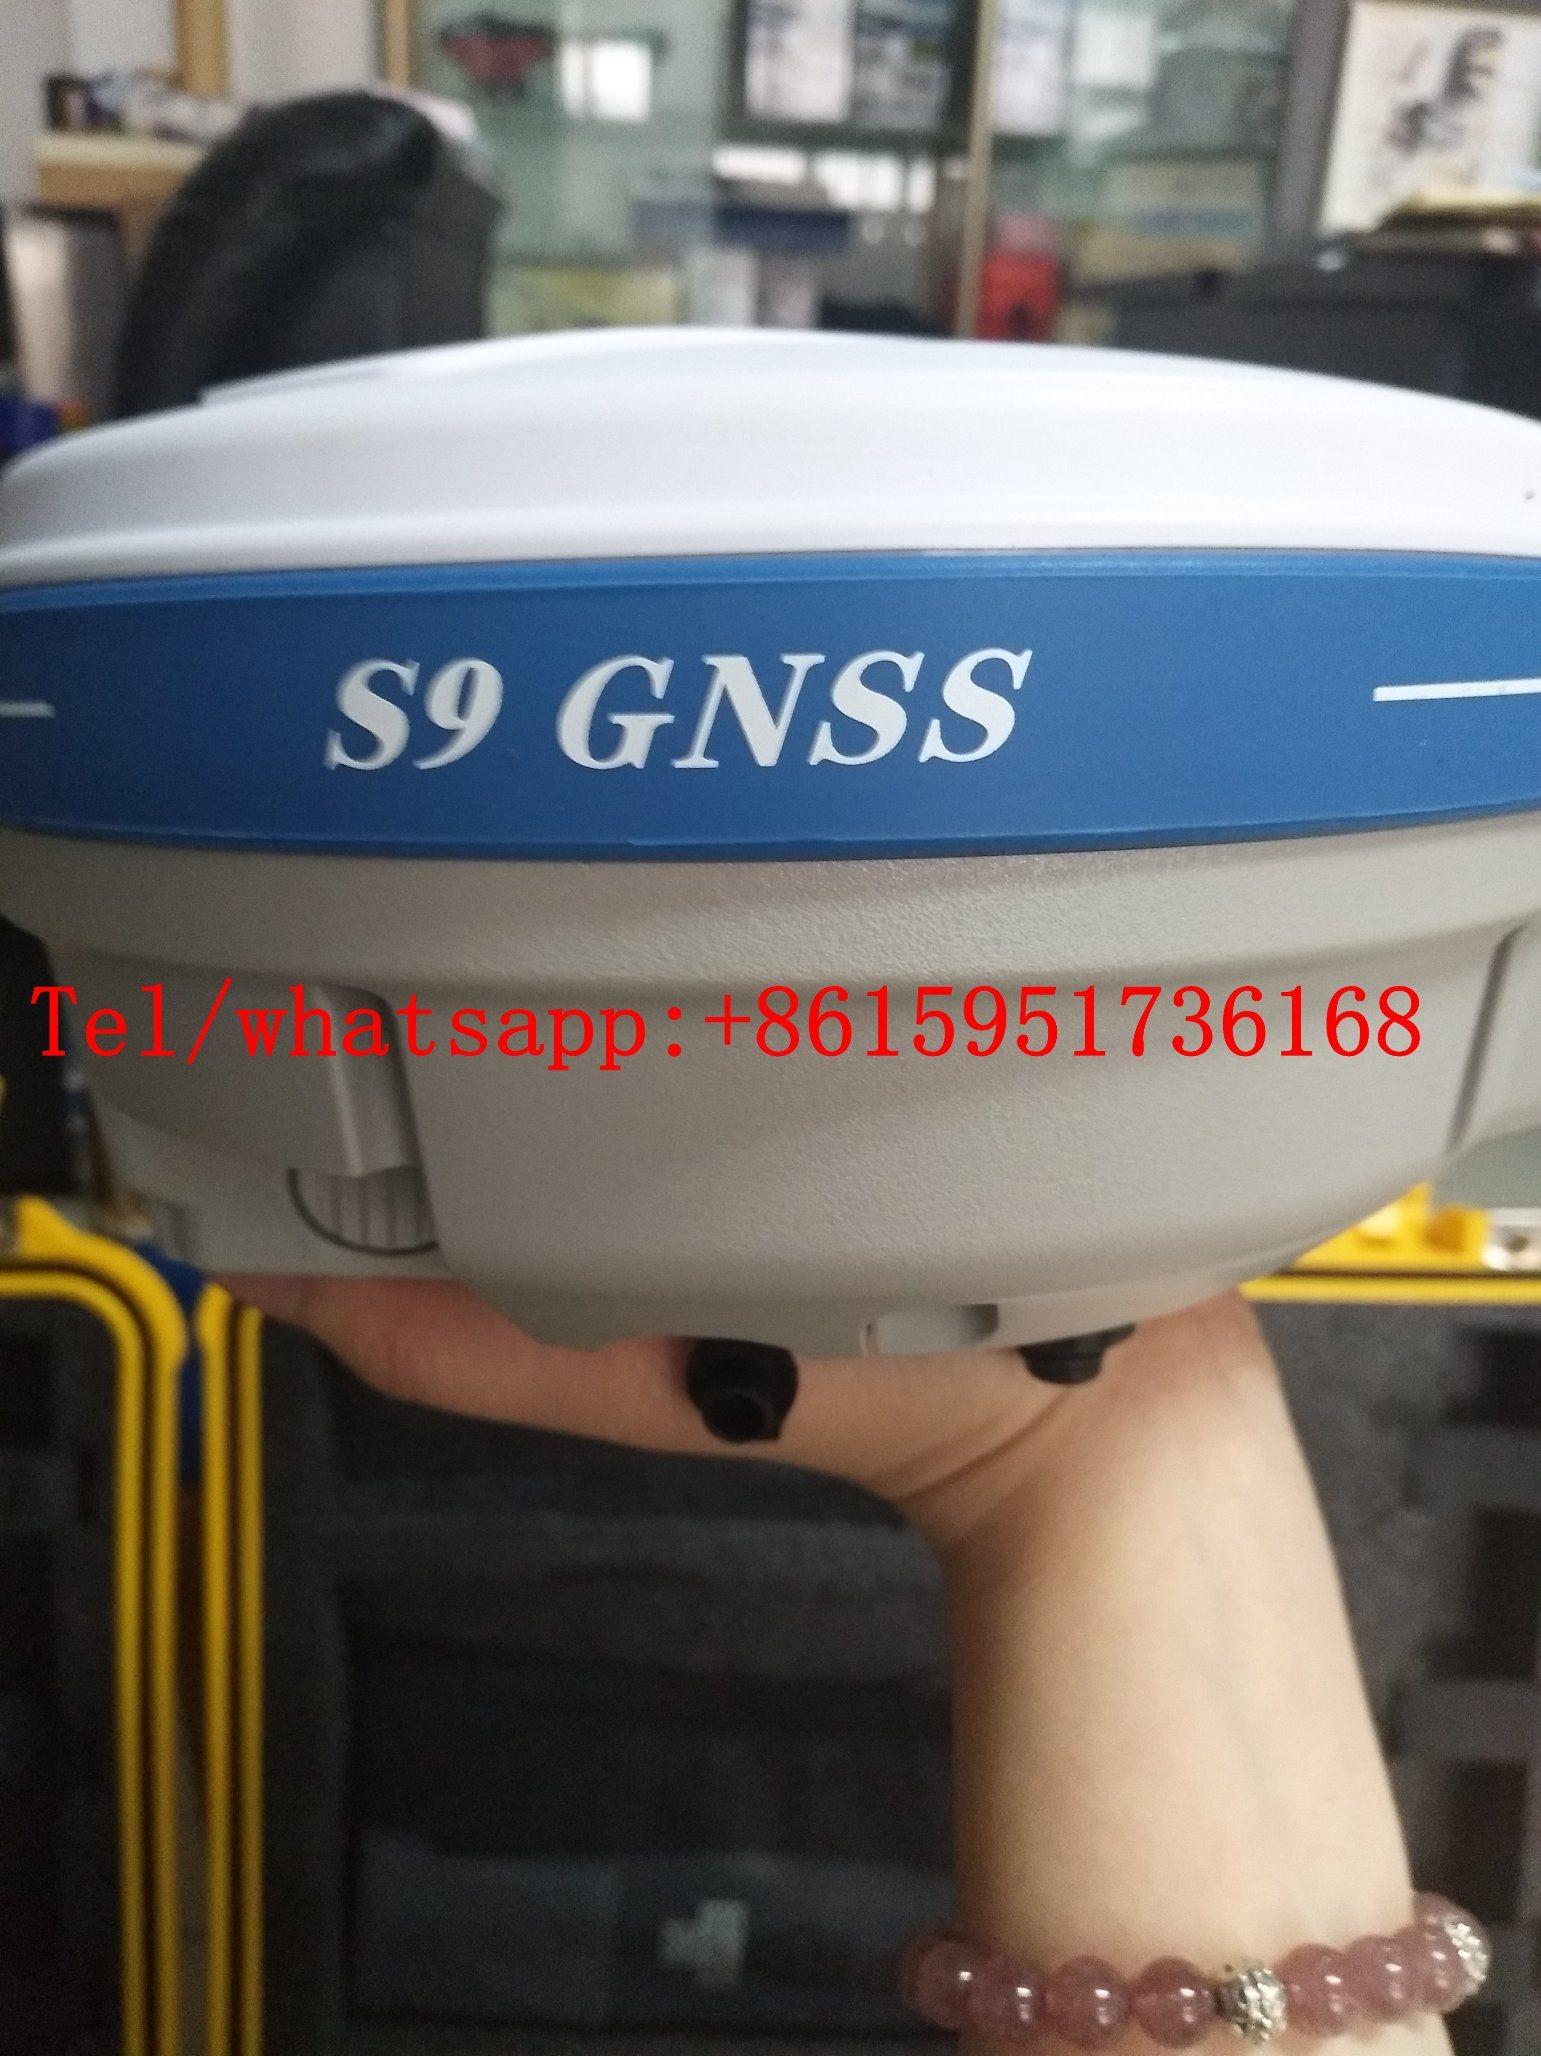 Chinese Brand Stonex S9 Gnss Rtk GPS